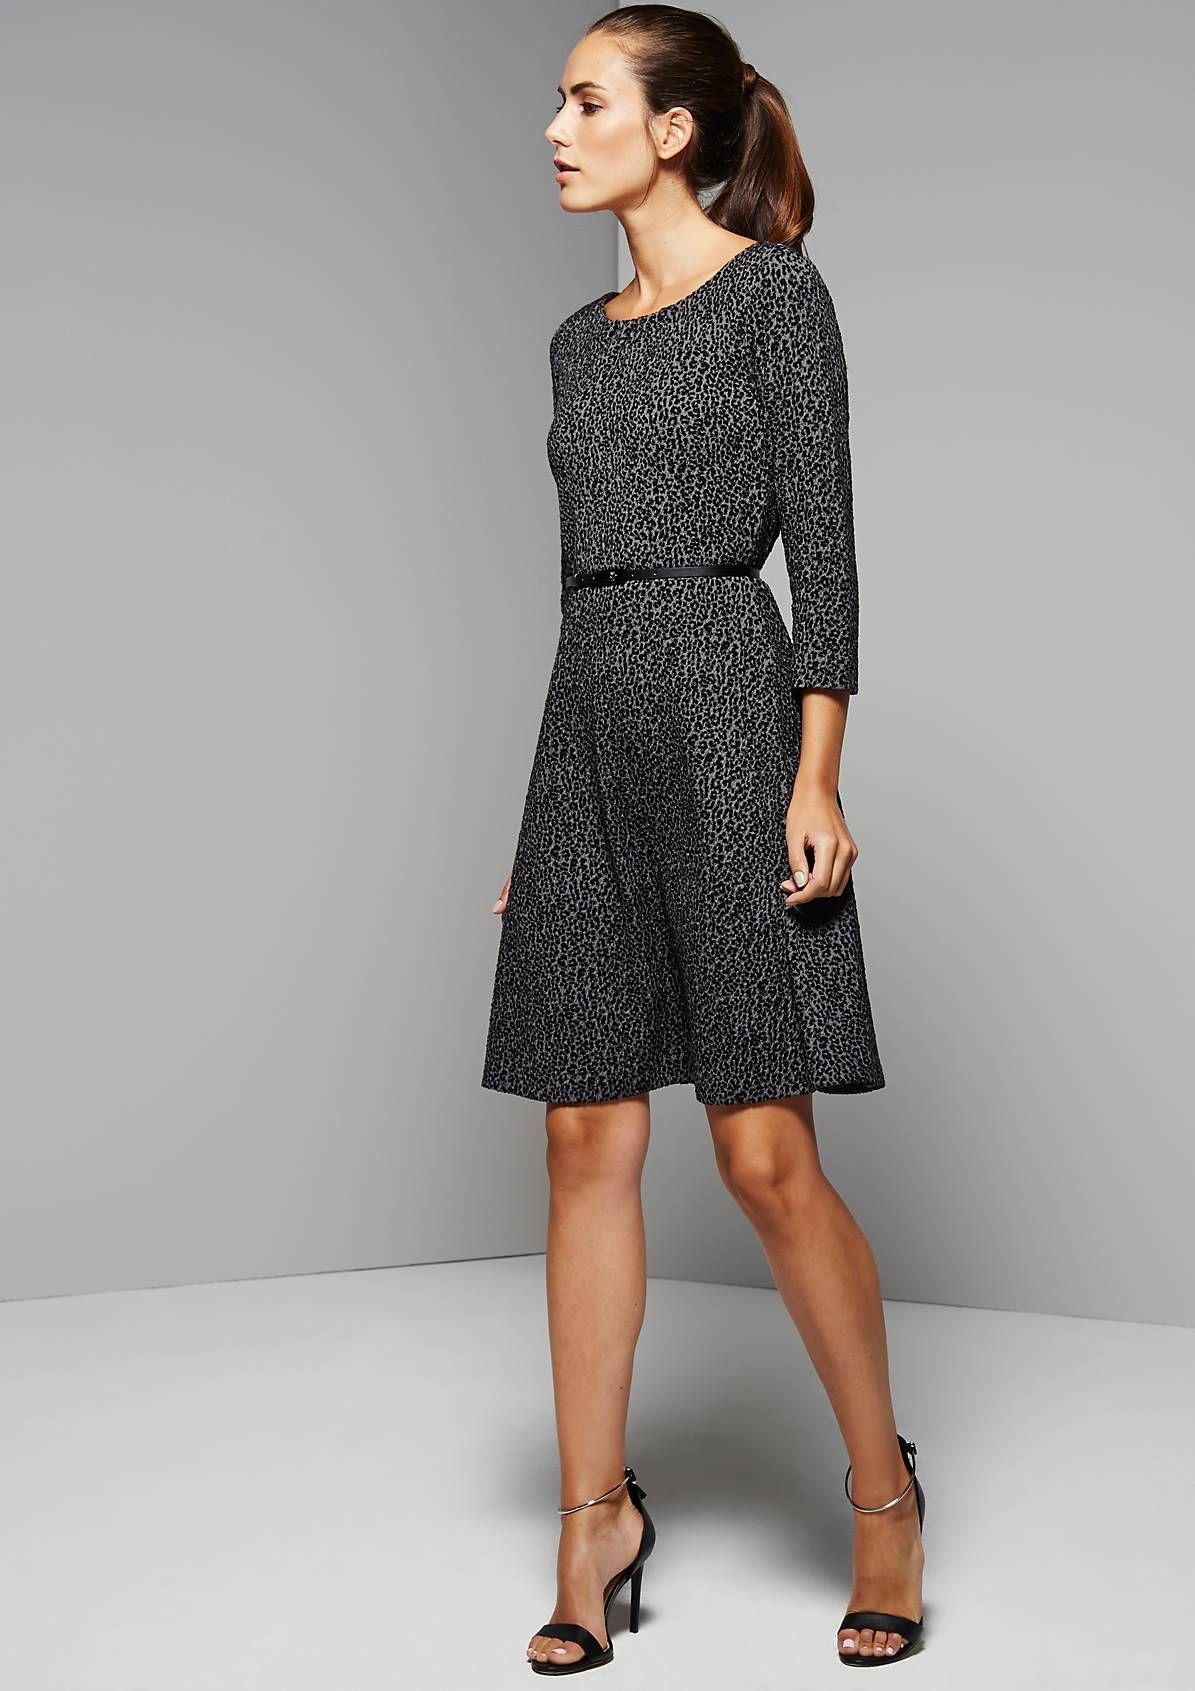 Abendkleid 20.20.20.20  Fashion & Mode  comma Online